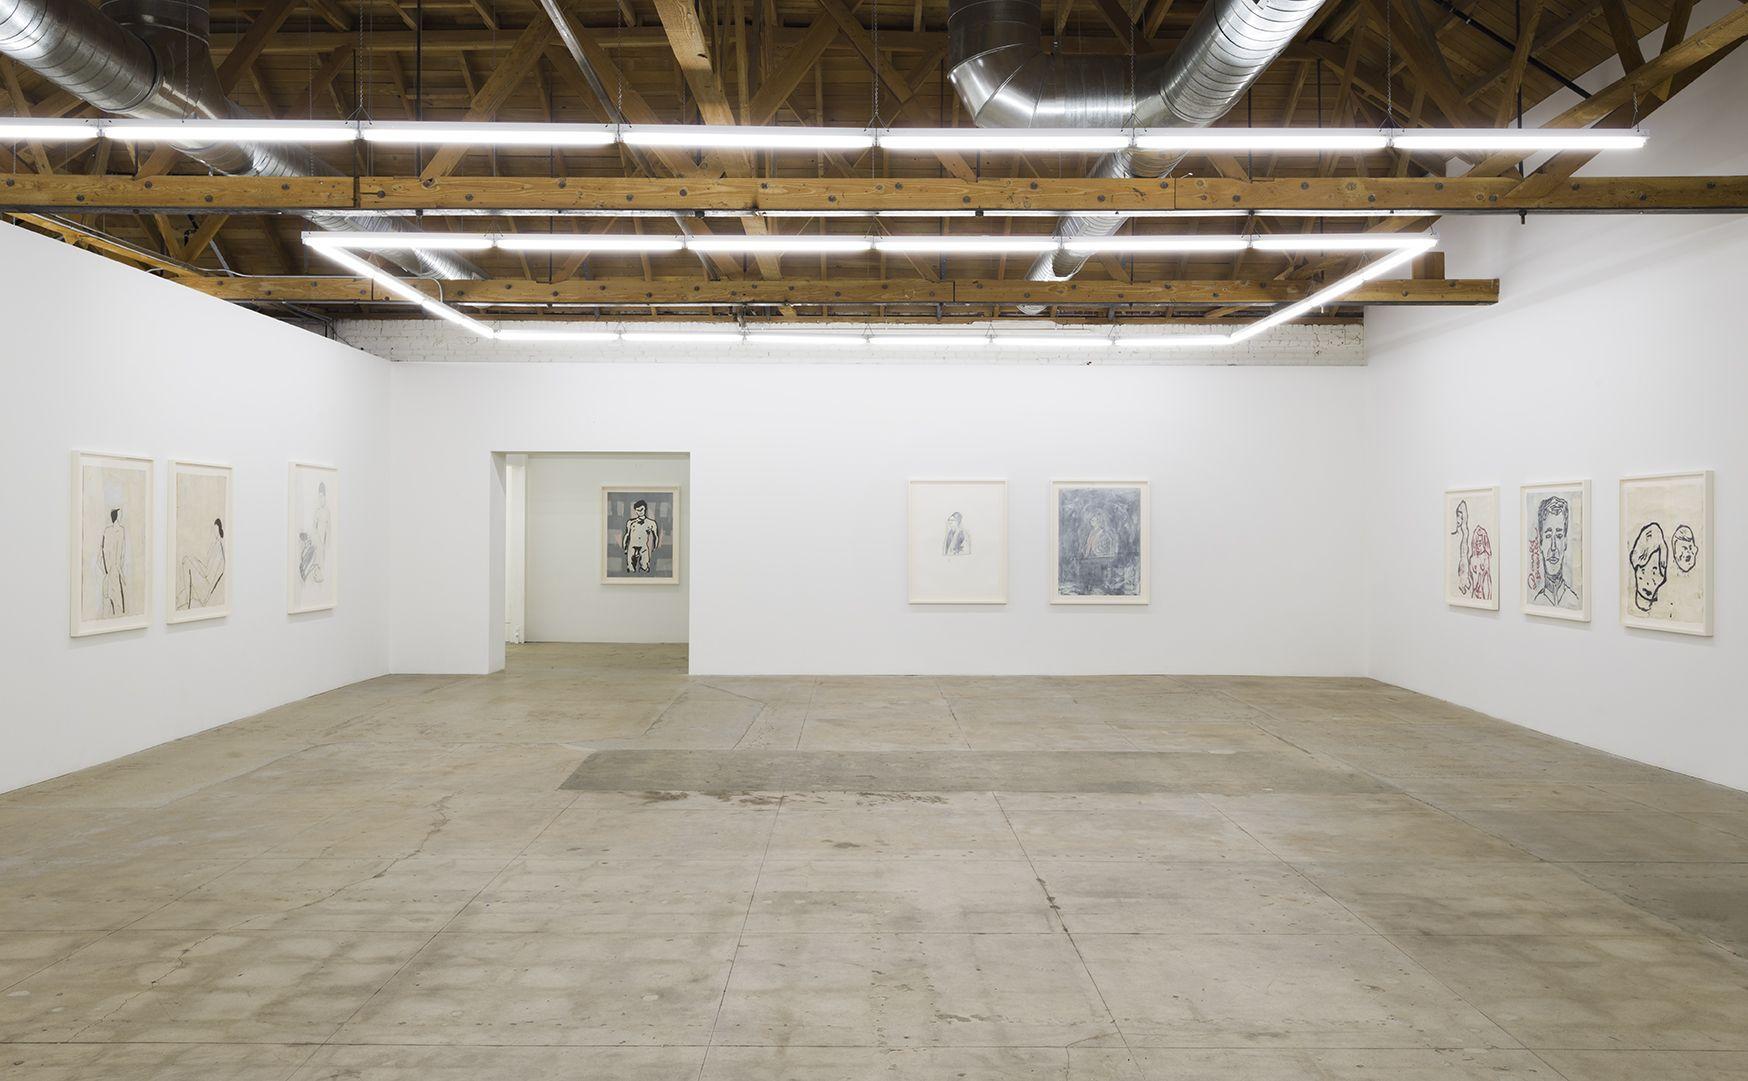 Installation of Donald BaechlerEarly Work 1980 - 1984